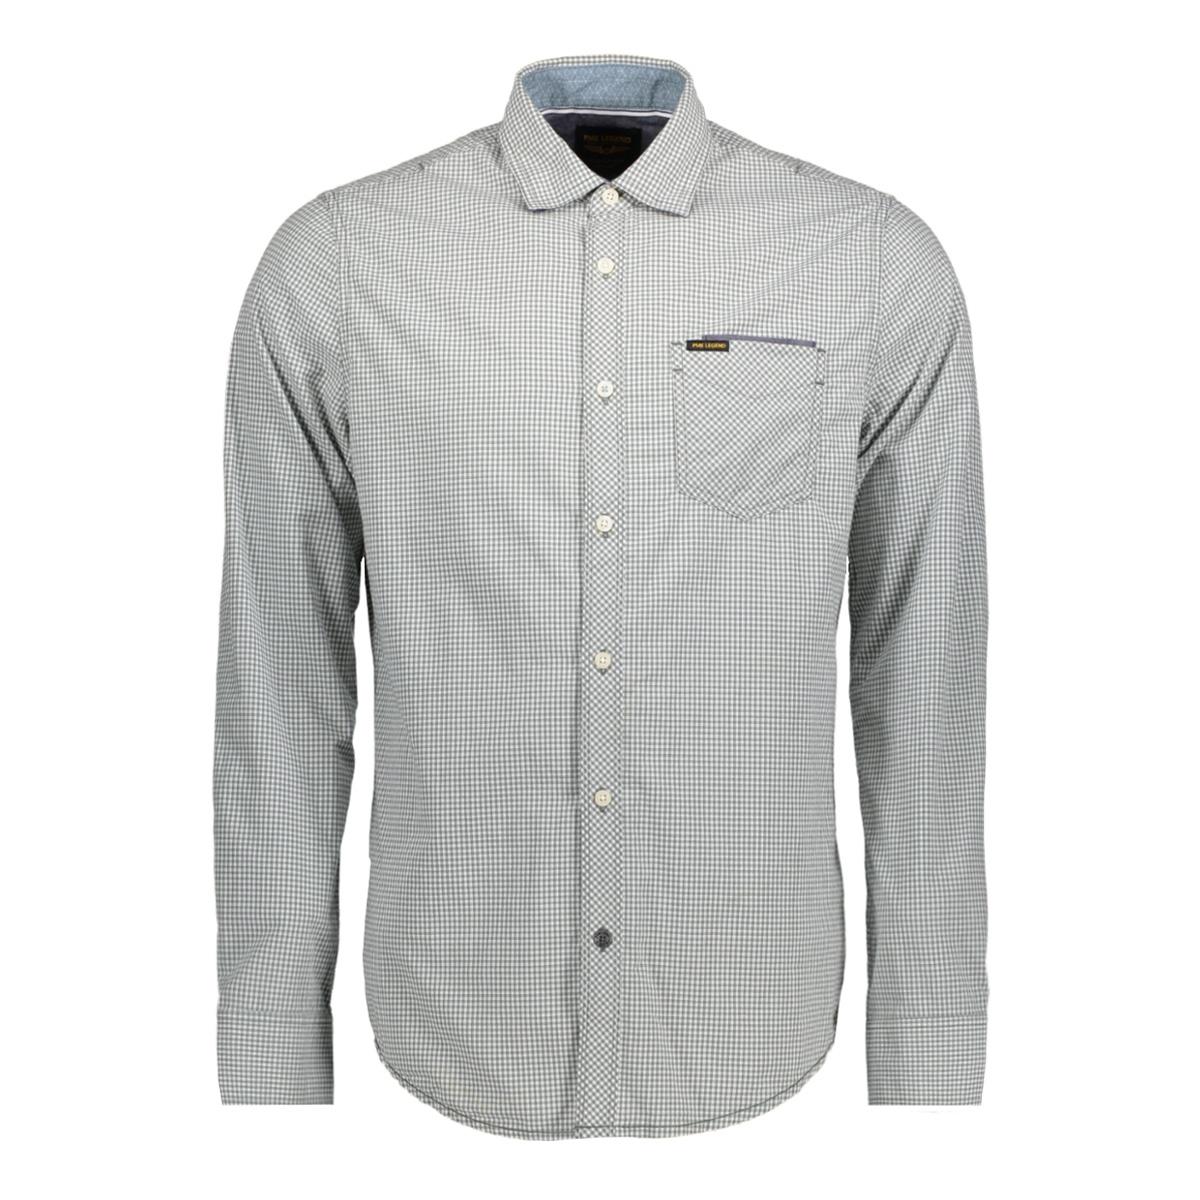 psi177206 pme legend overhemd 6385